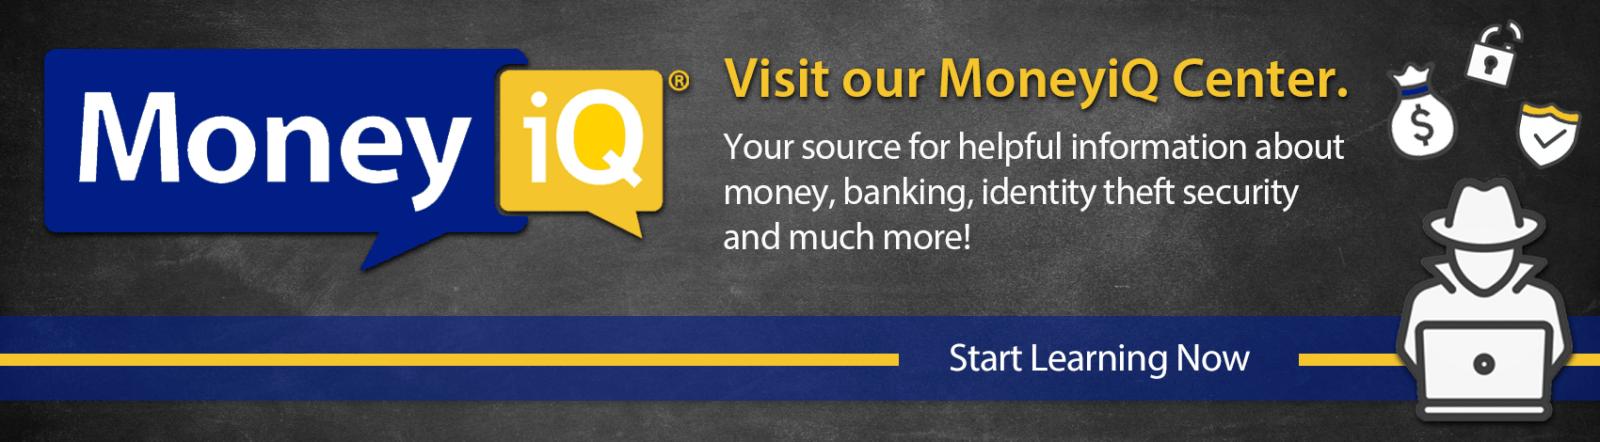 Visit Our MoneyiQ Center